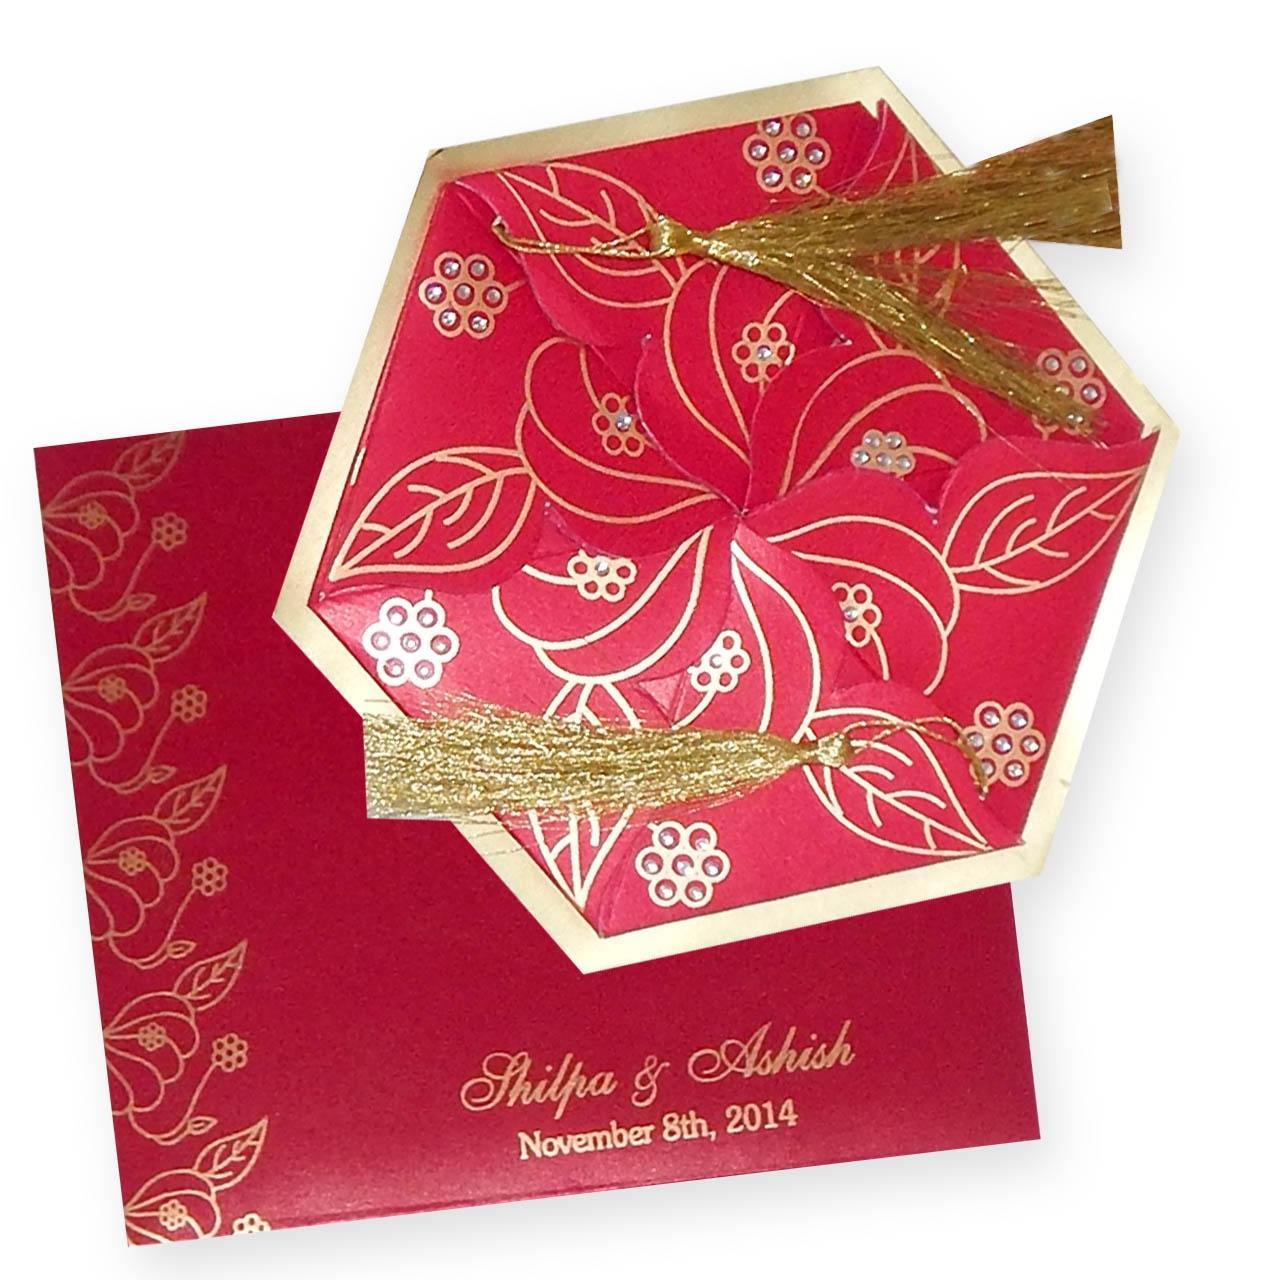 The Wedding Cards Online | Find a Wedding Supplier